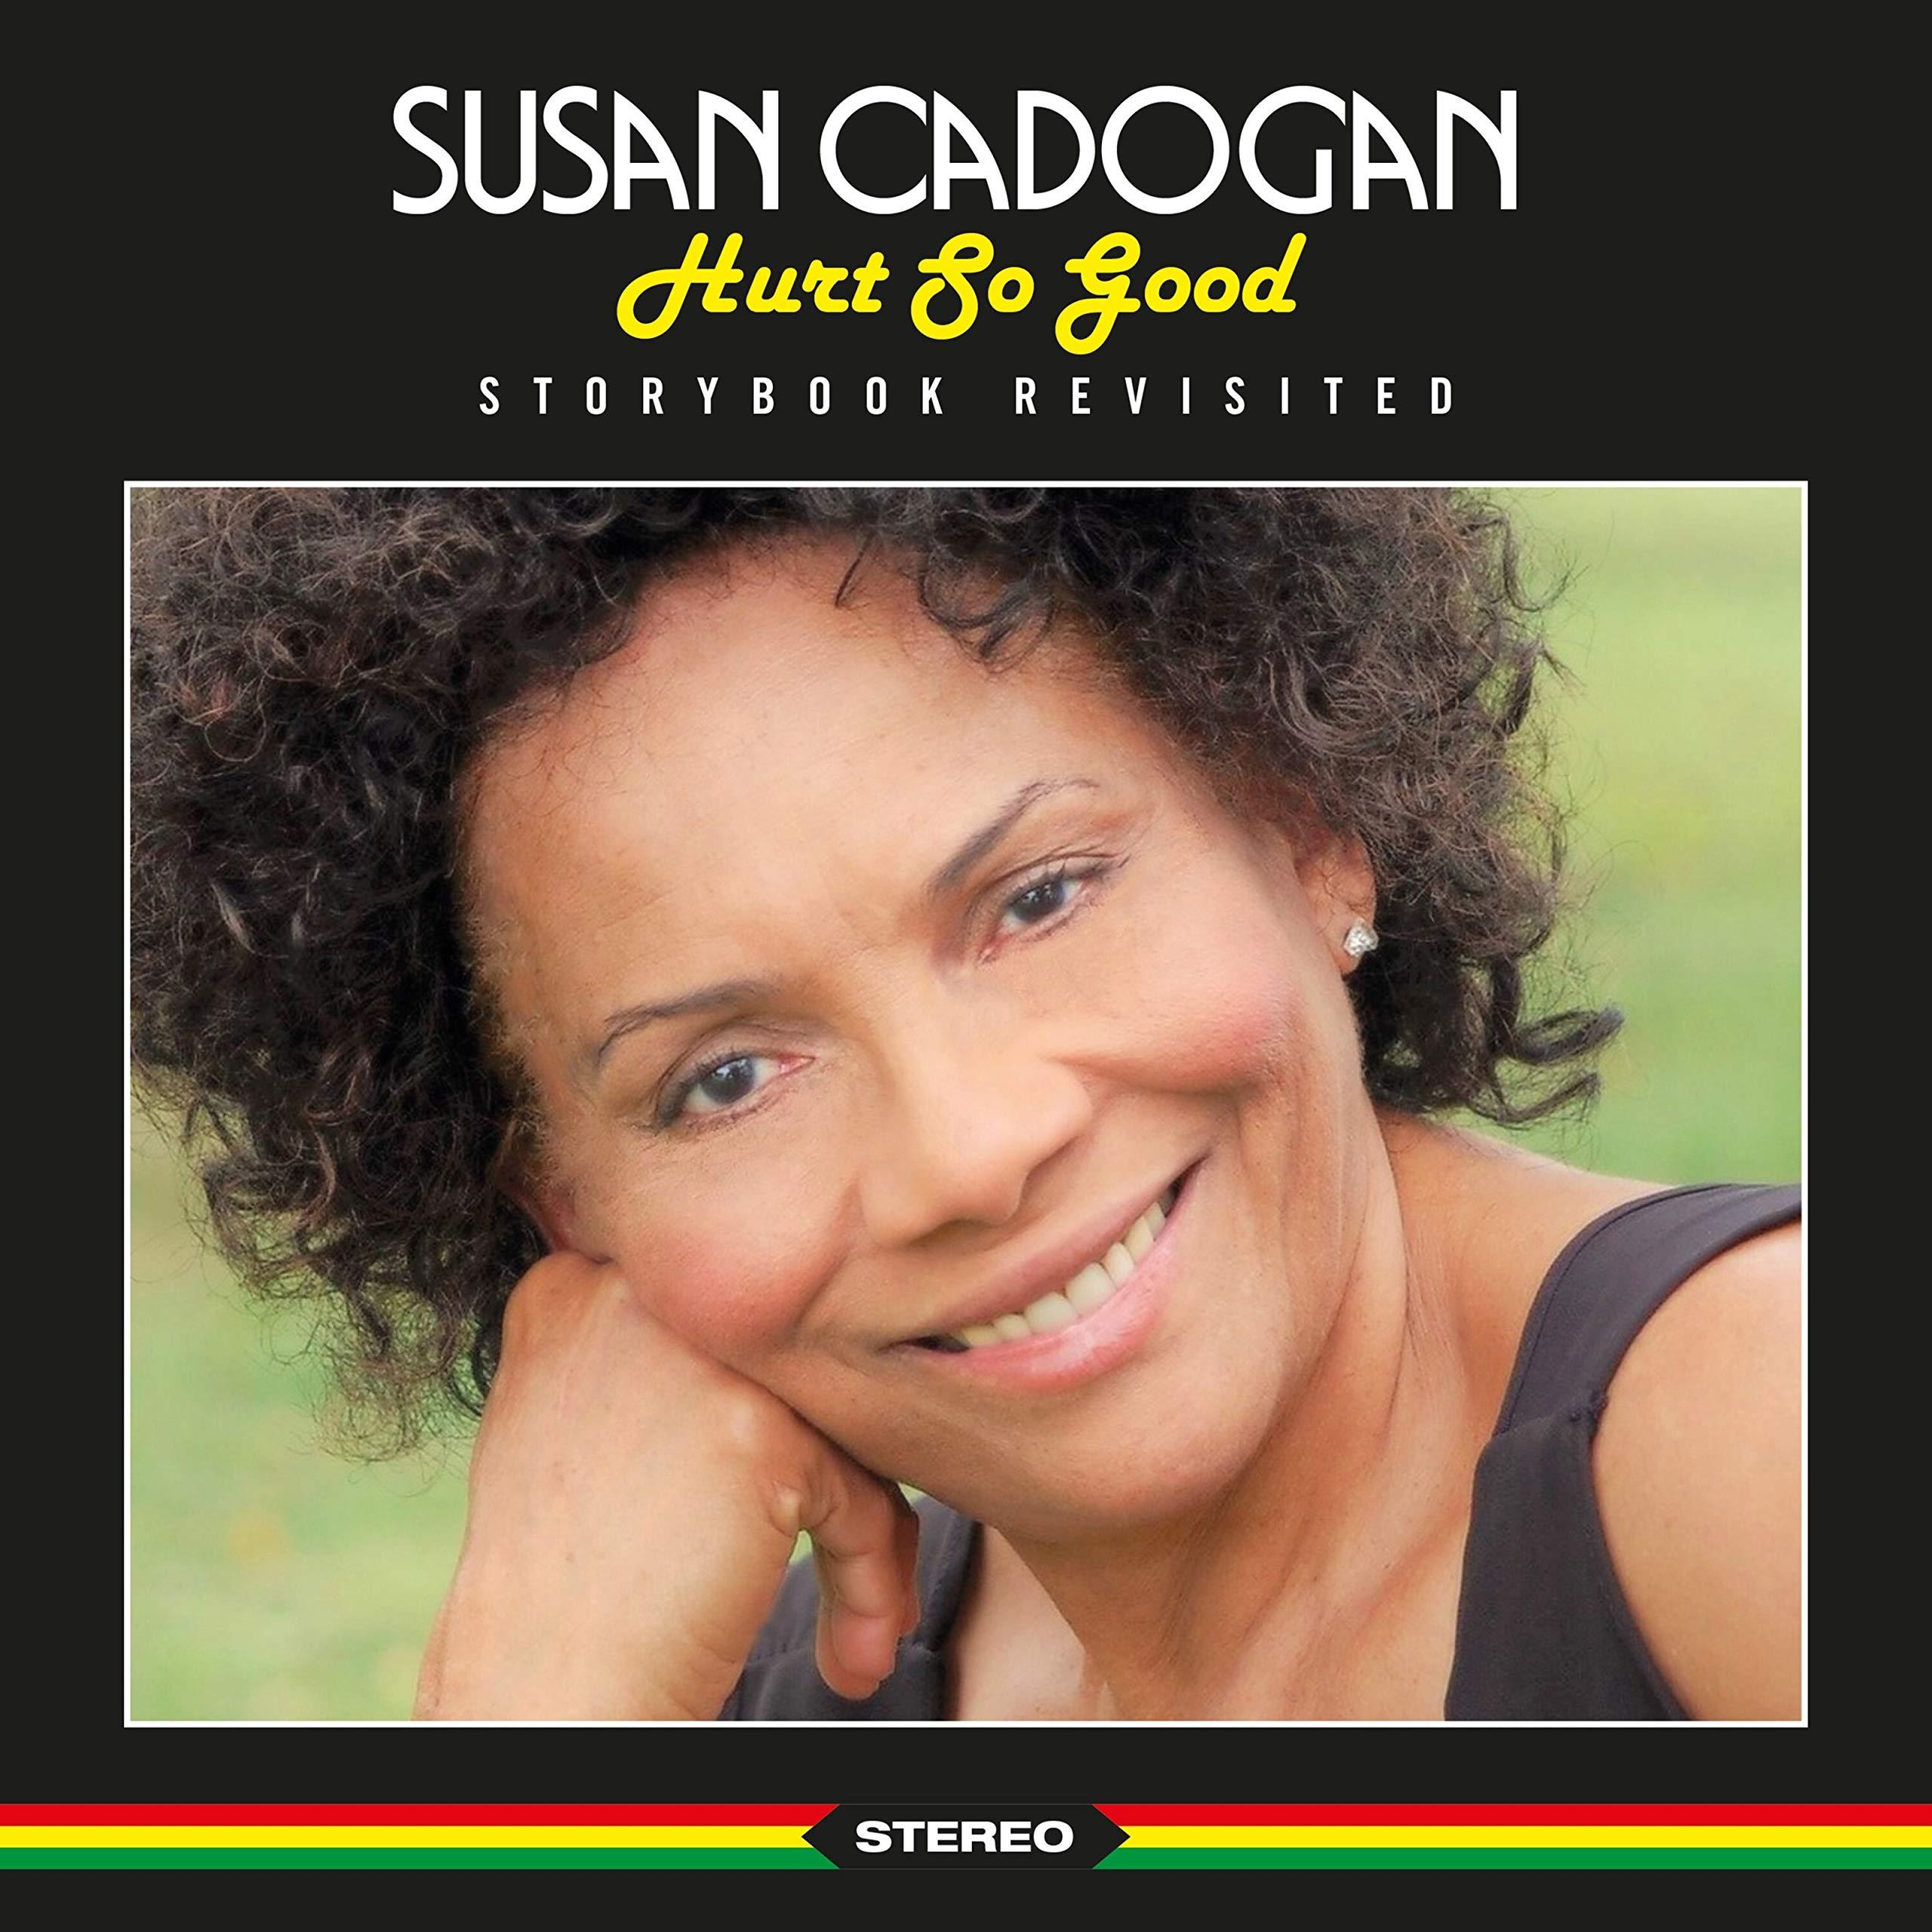 Susan Cadogan – Hurt So Good Storybook Revisited (2020) [FLAC]